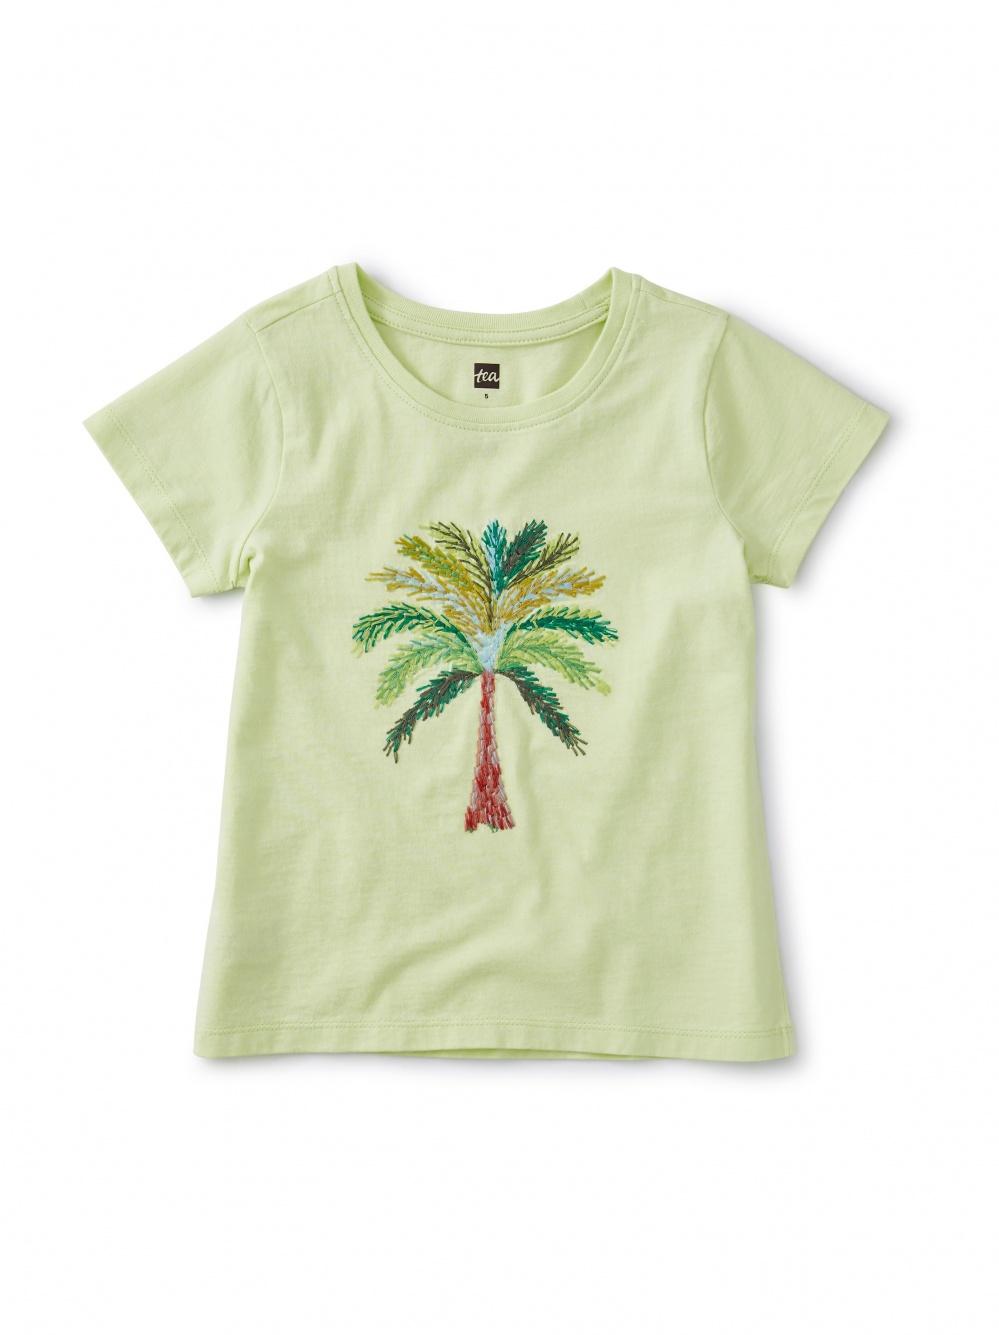 Akhmim Embroidered Palm Tee